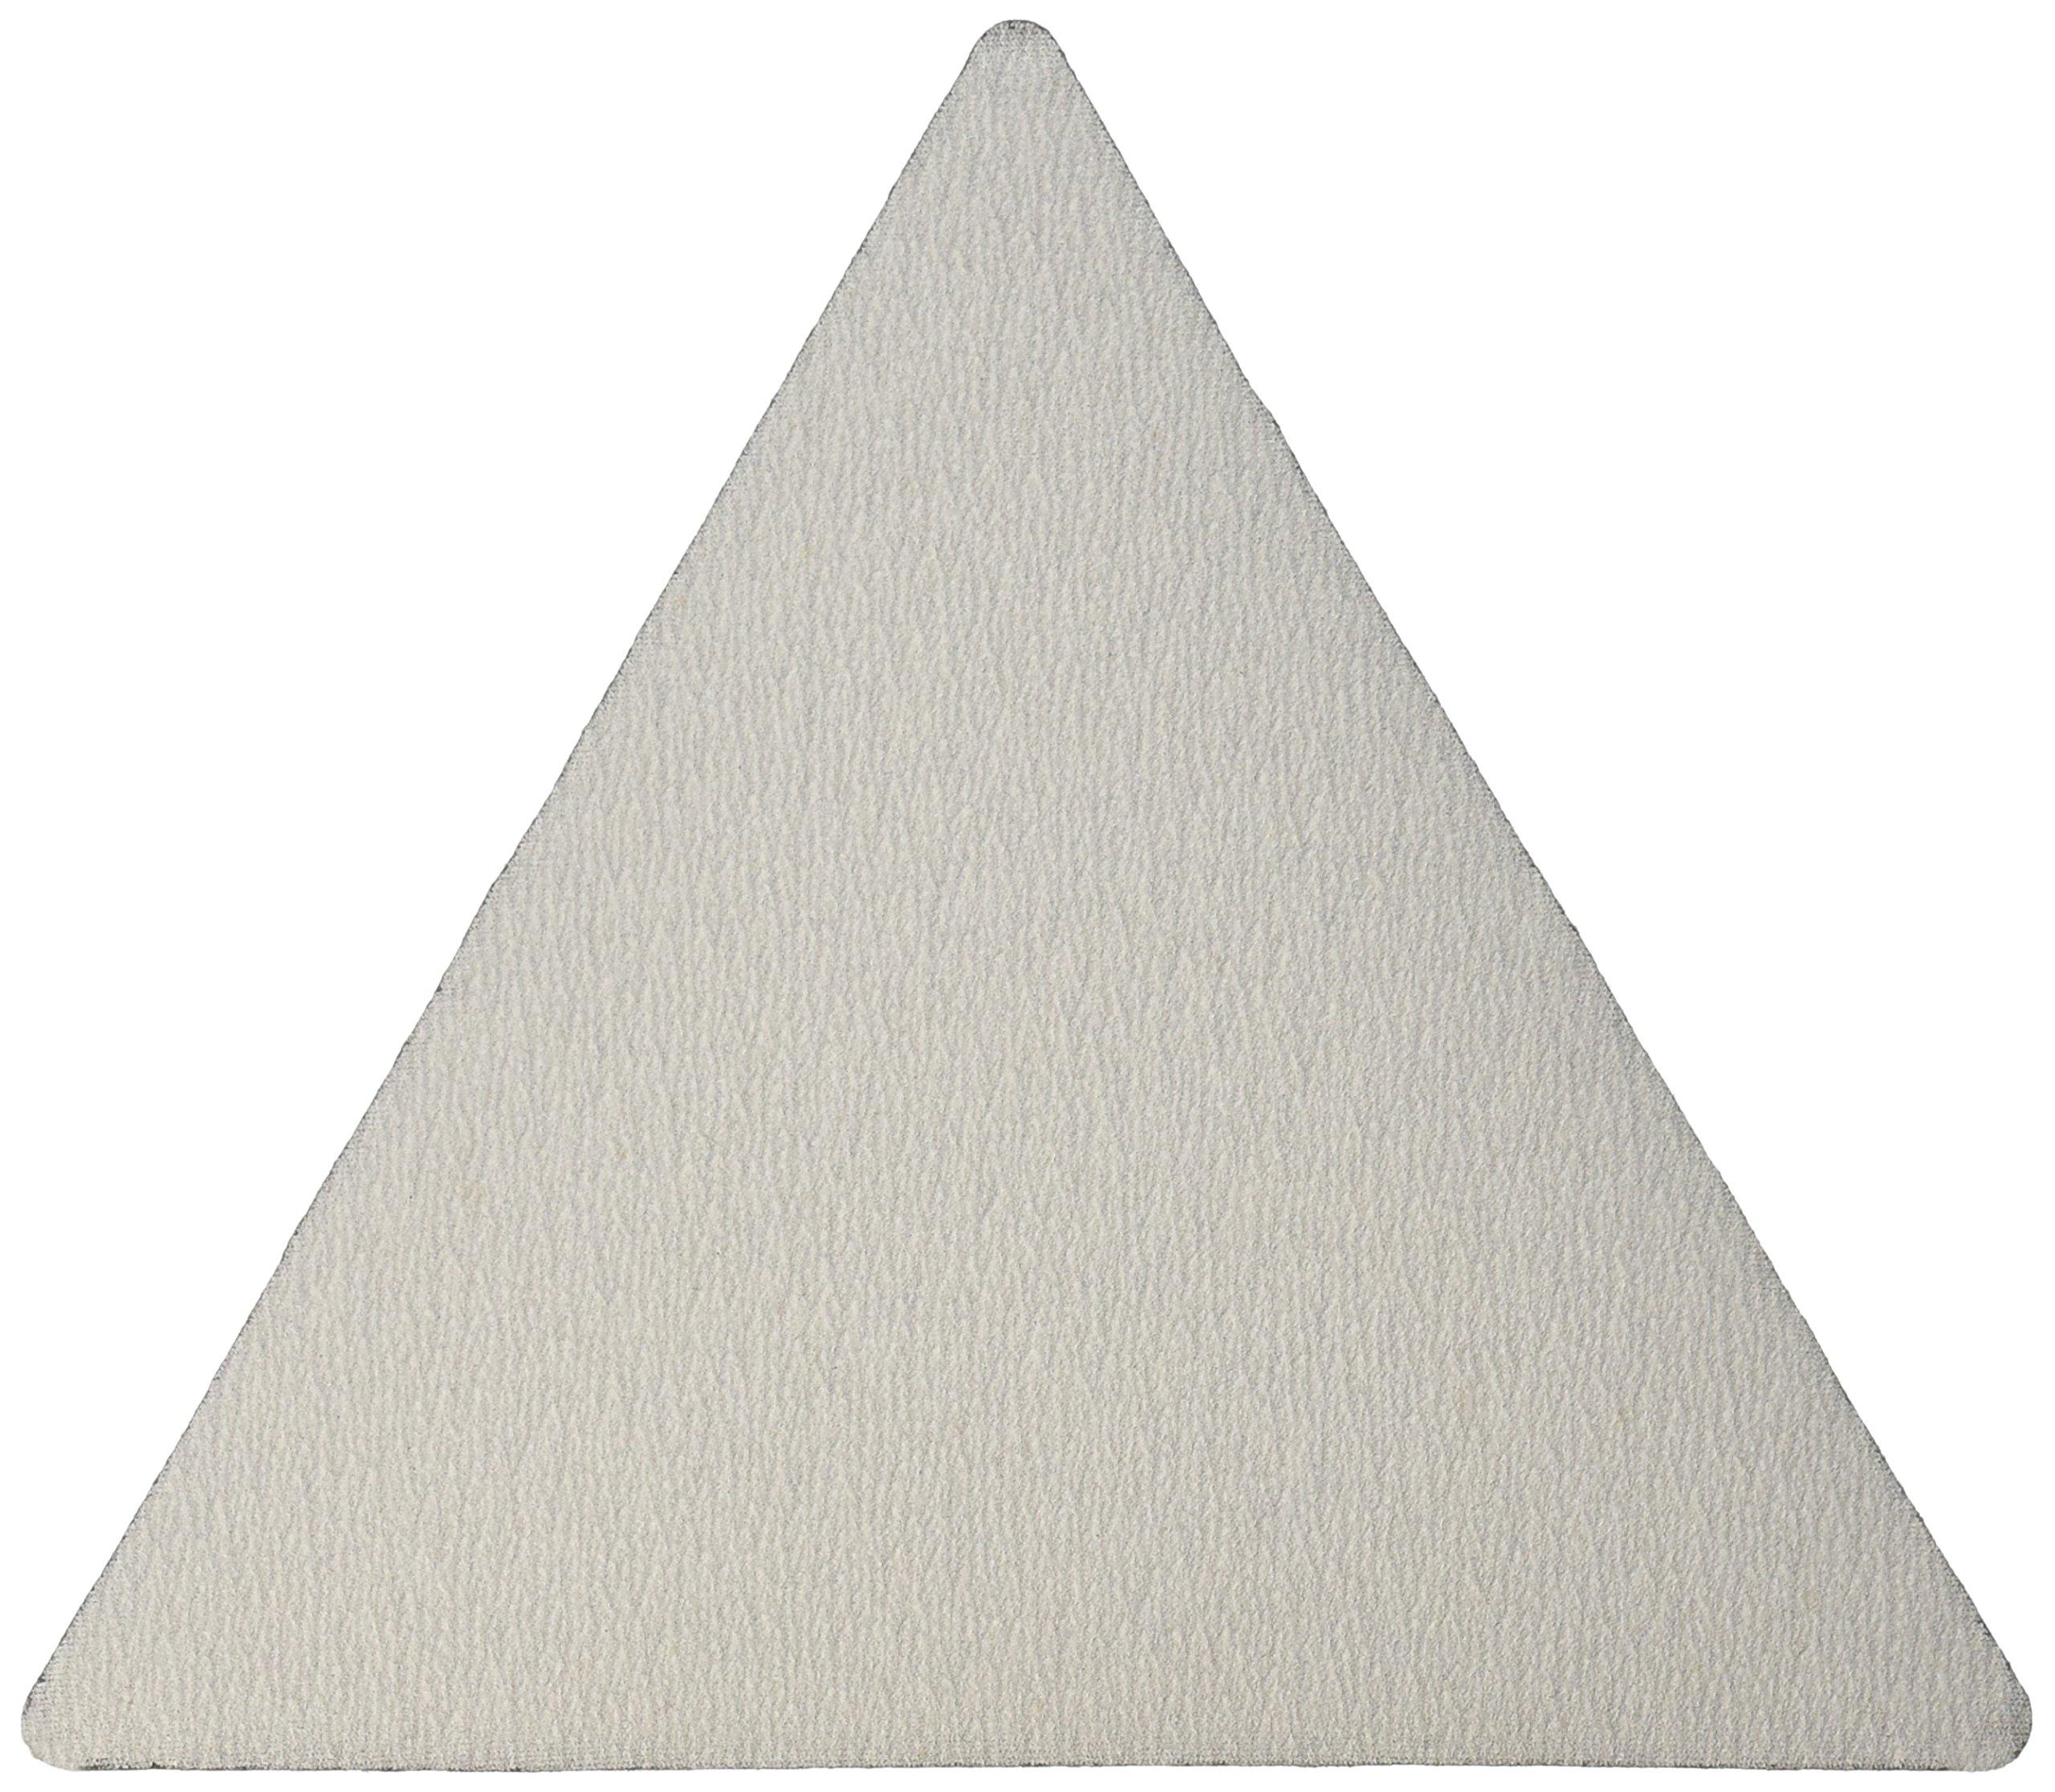 Full Circle International Inc. TG150 Level180 Sandpaper Triangles 150 Grit 5-Pack